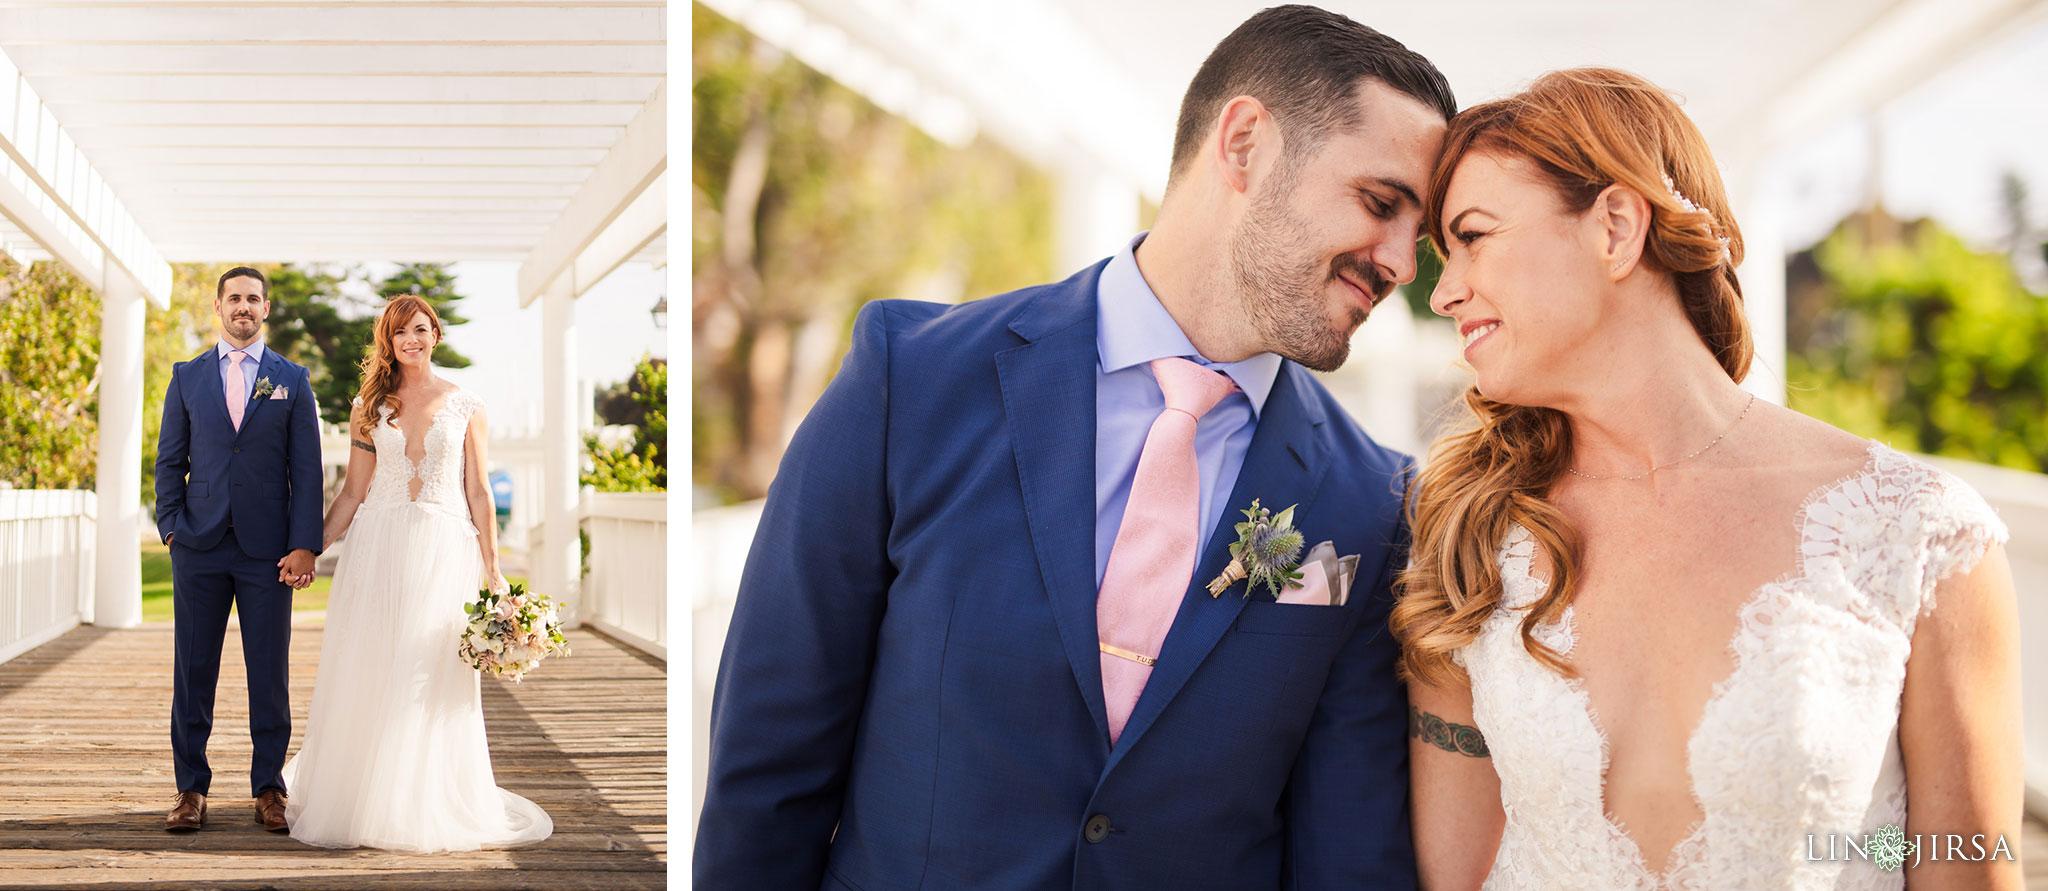 019 marina del rey hotel wedding photography